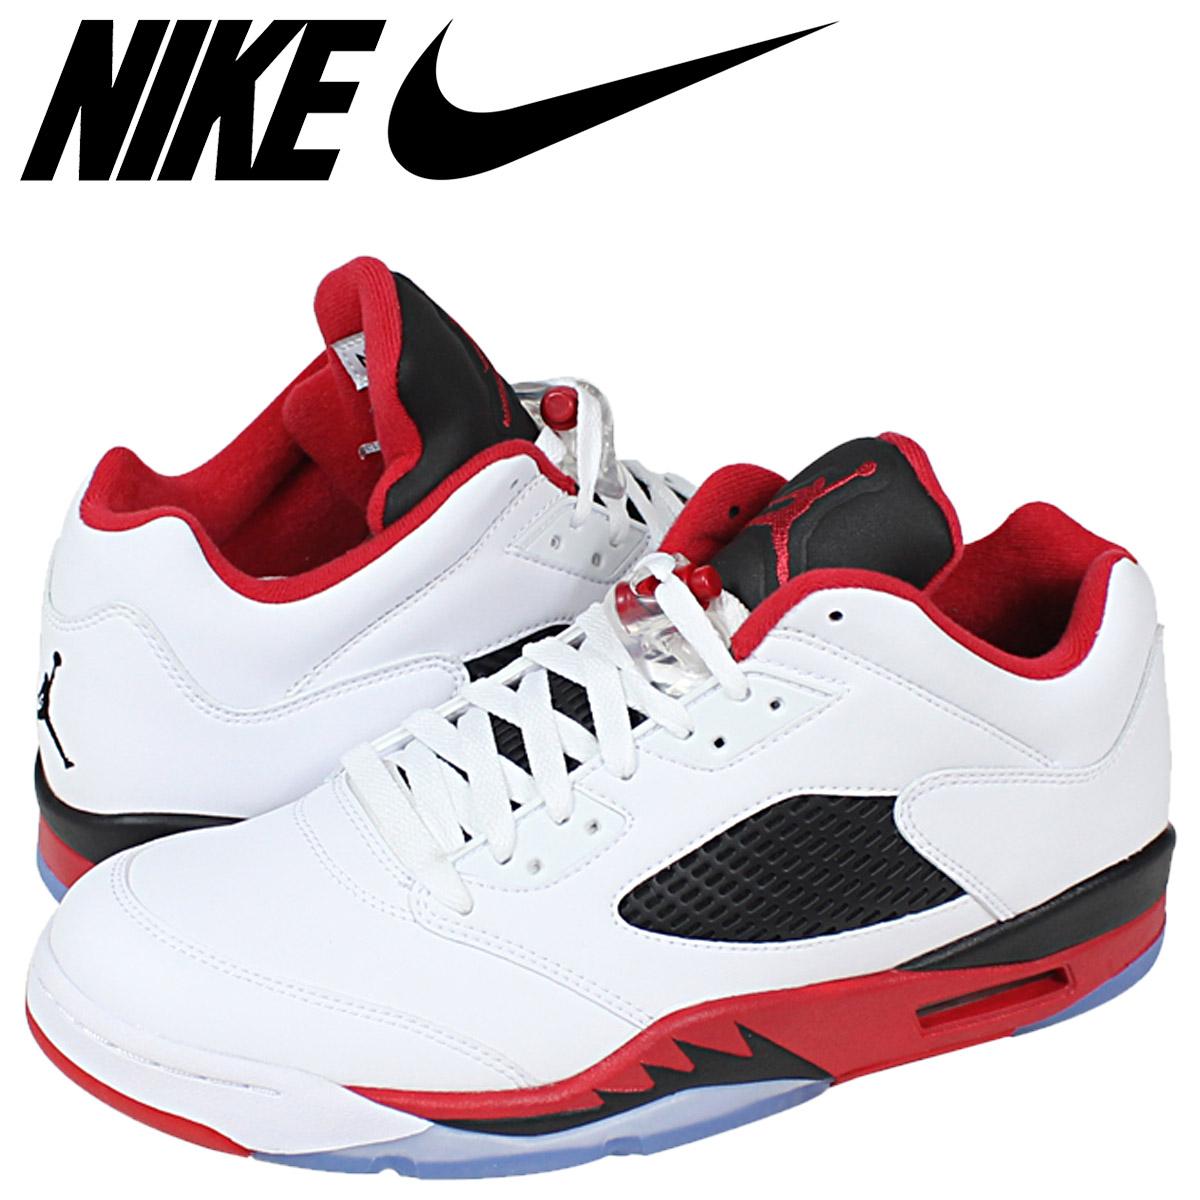 cheap for discount 4070c d7d48 Whats up Sports: NIKE Nike Air Jordan sneakers AIR JORDAN 5 RETRO ...